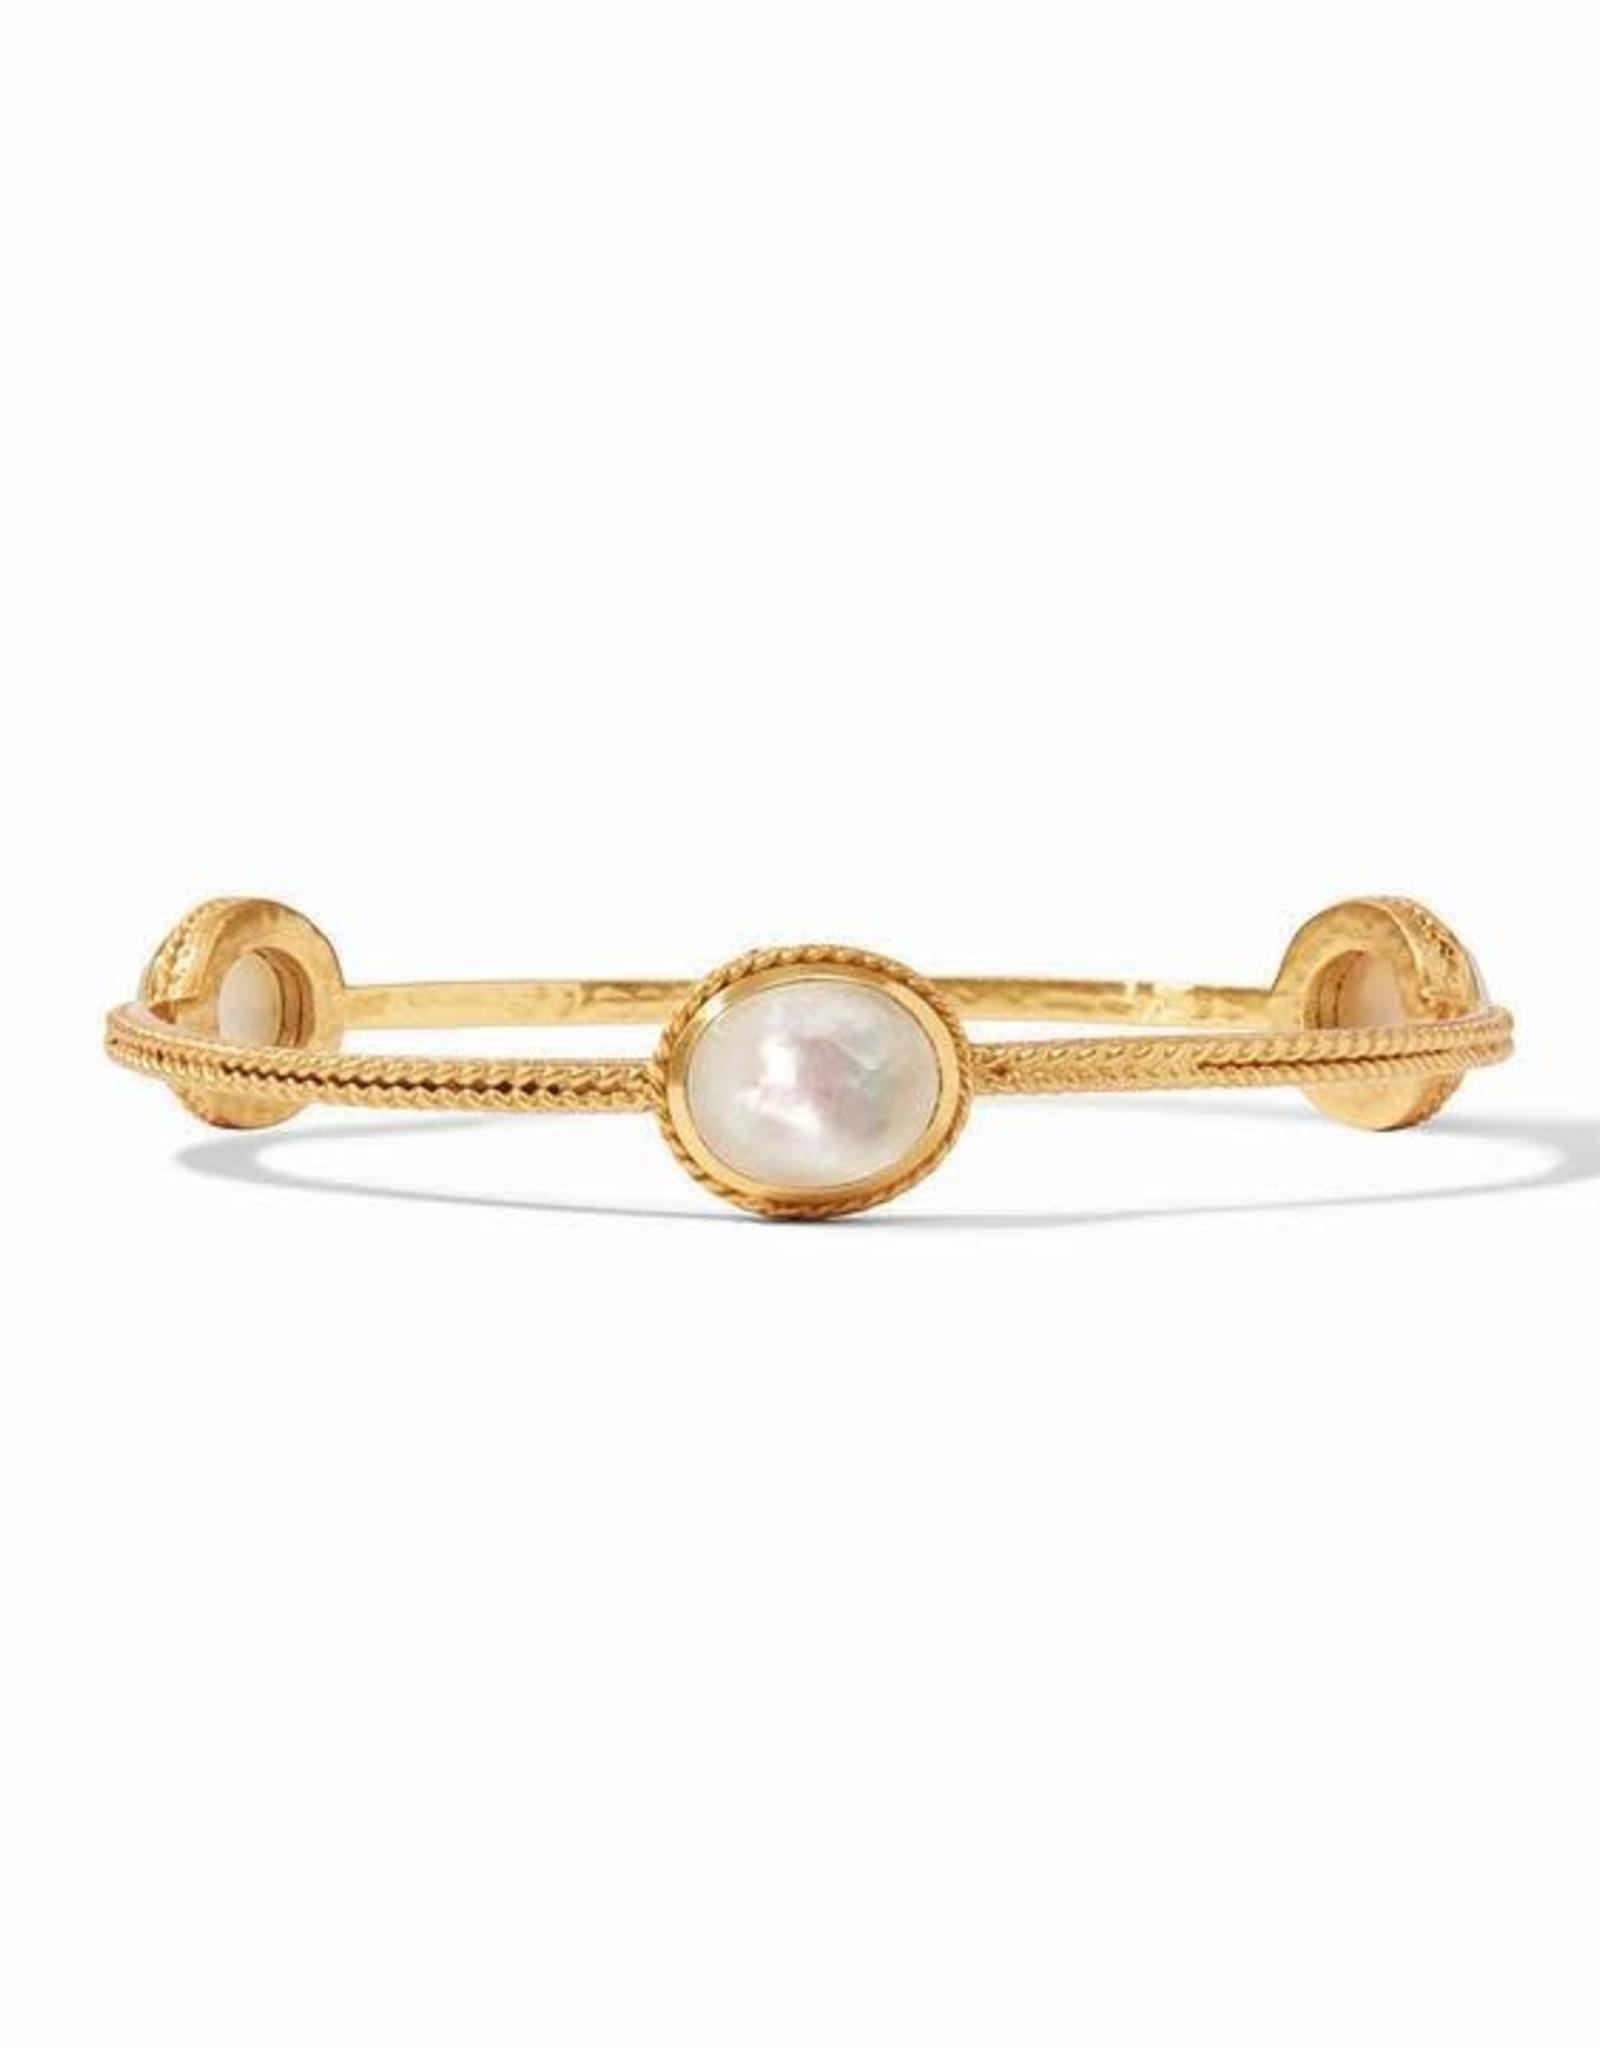 Julie Vos Calypso Bangle Gold Pearl Medium